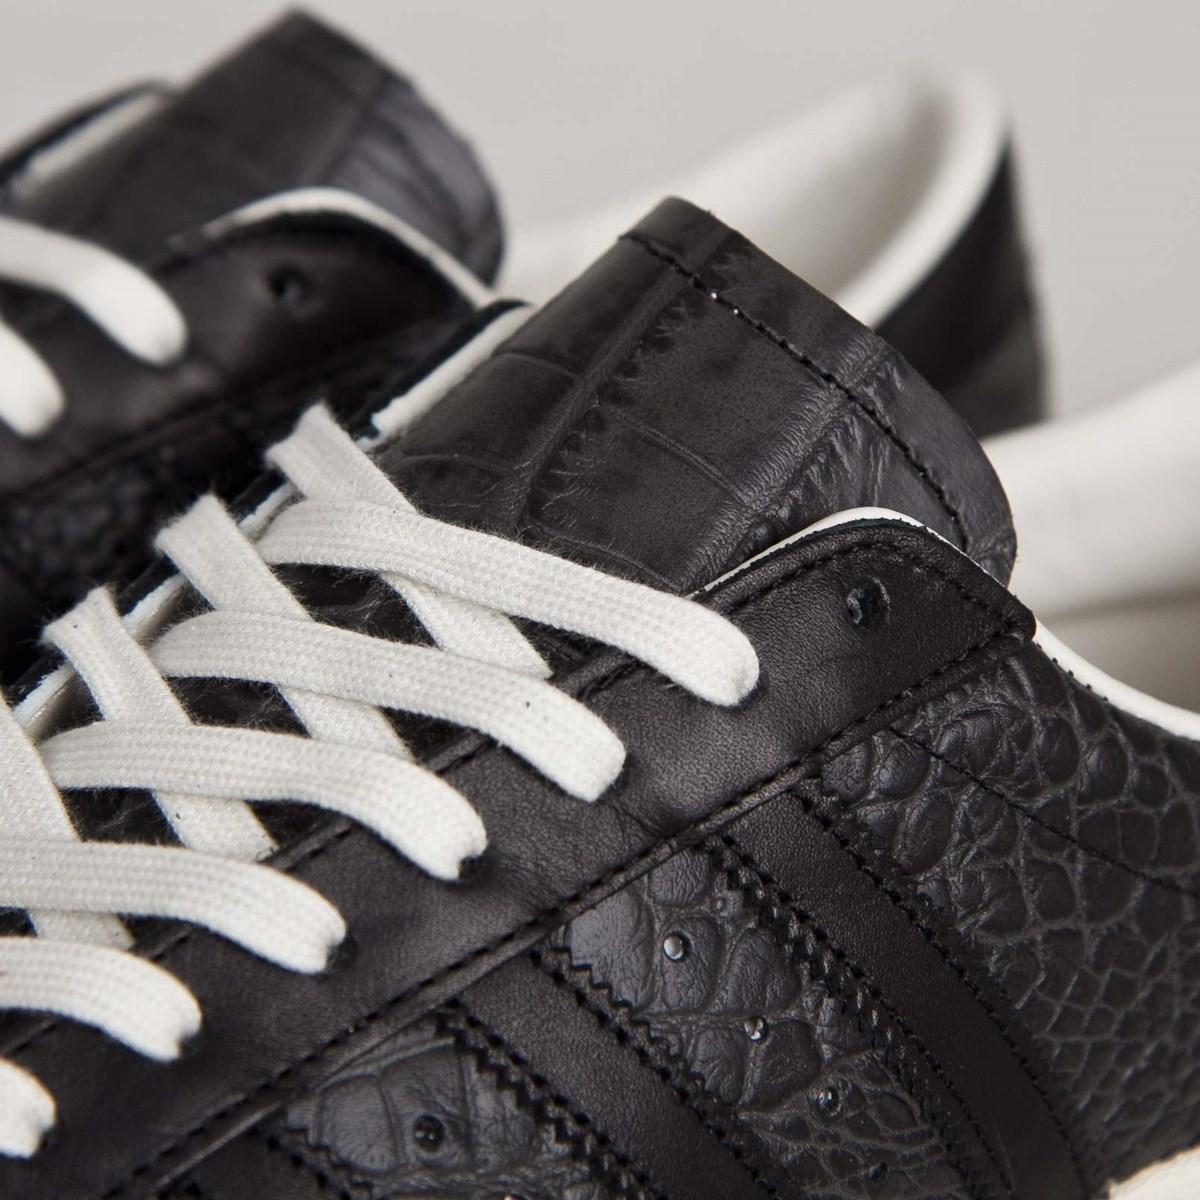 info for 3a6d8 4a0ed adidas Superstar 80v - NBHD - B34070 - Sneakersnstuff  sneakers   streetwear online since 1999